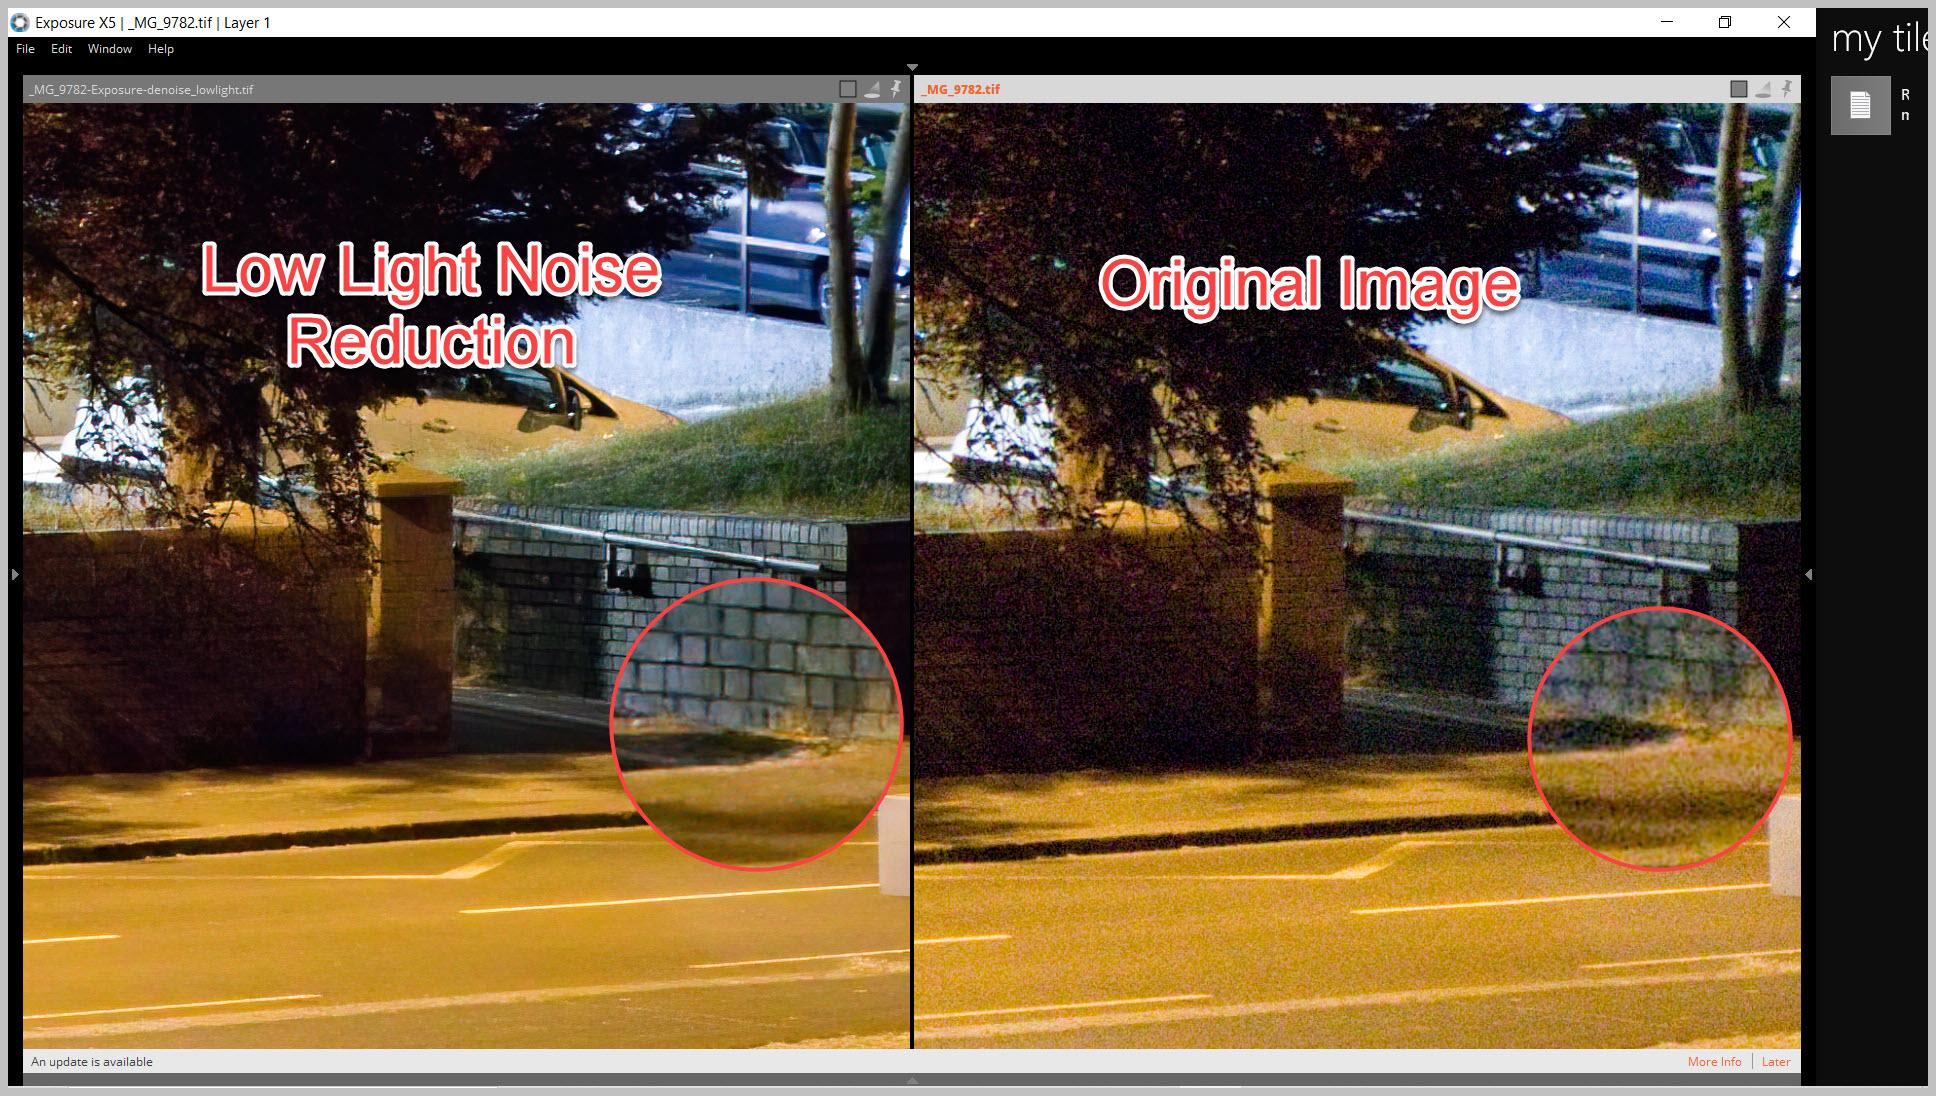 Noise Reduction - Low Light